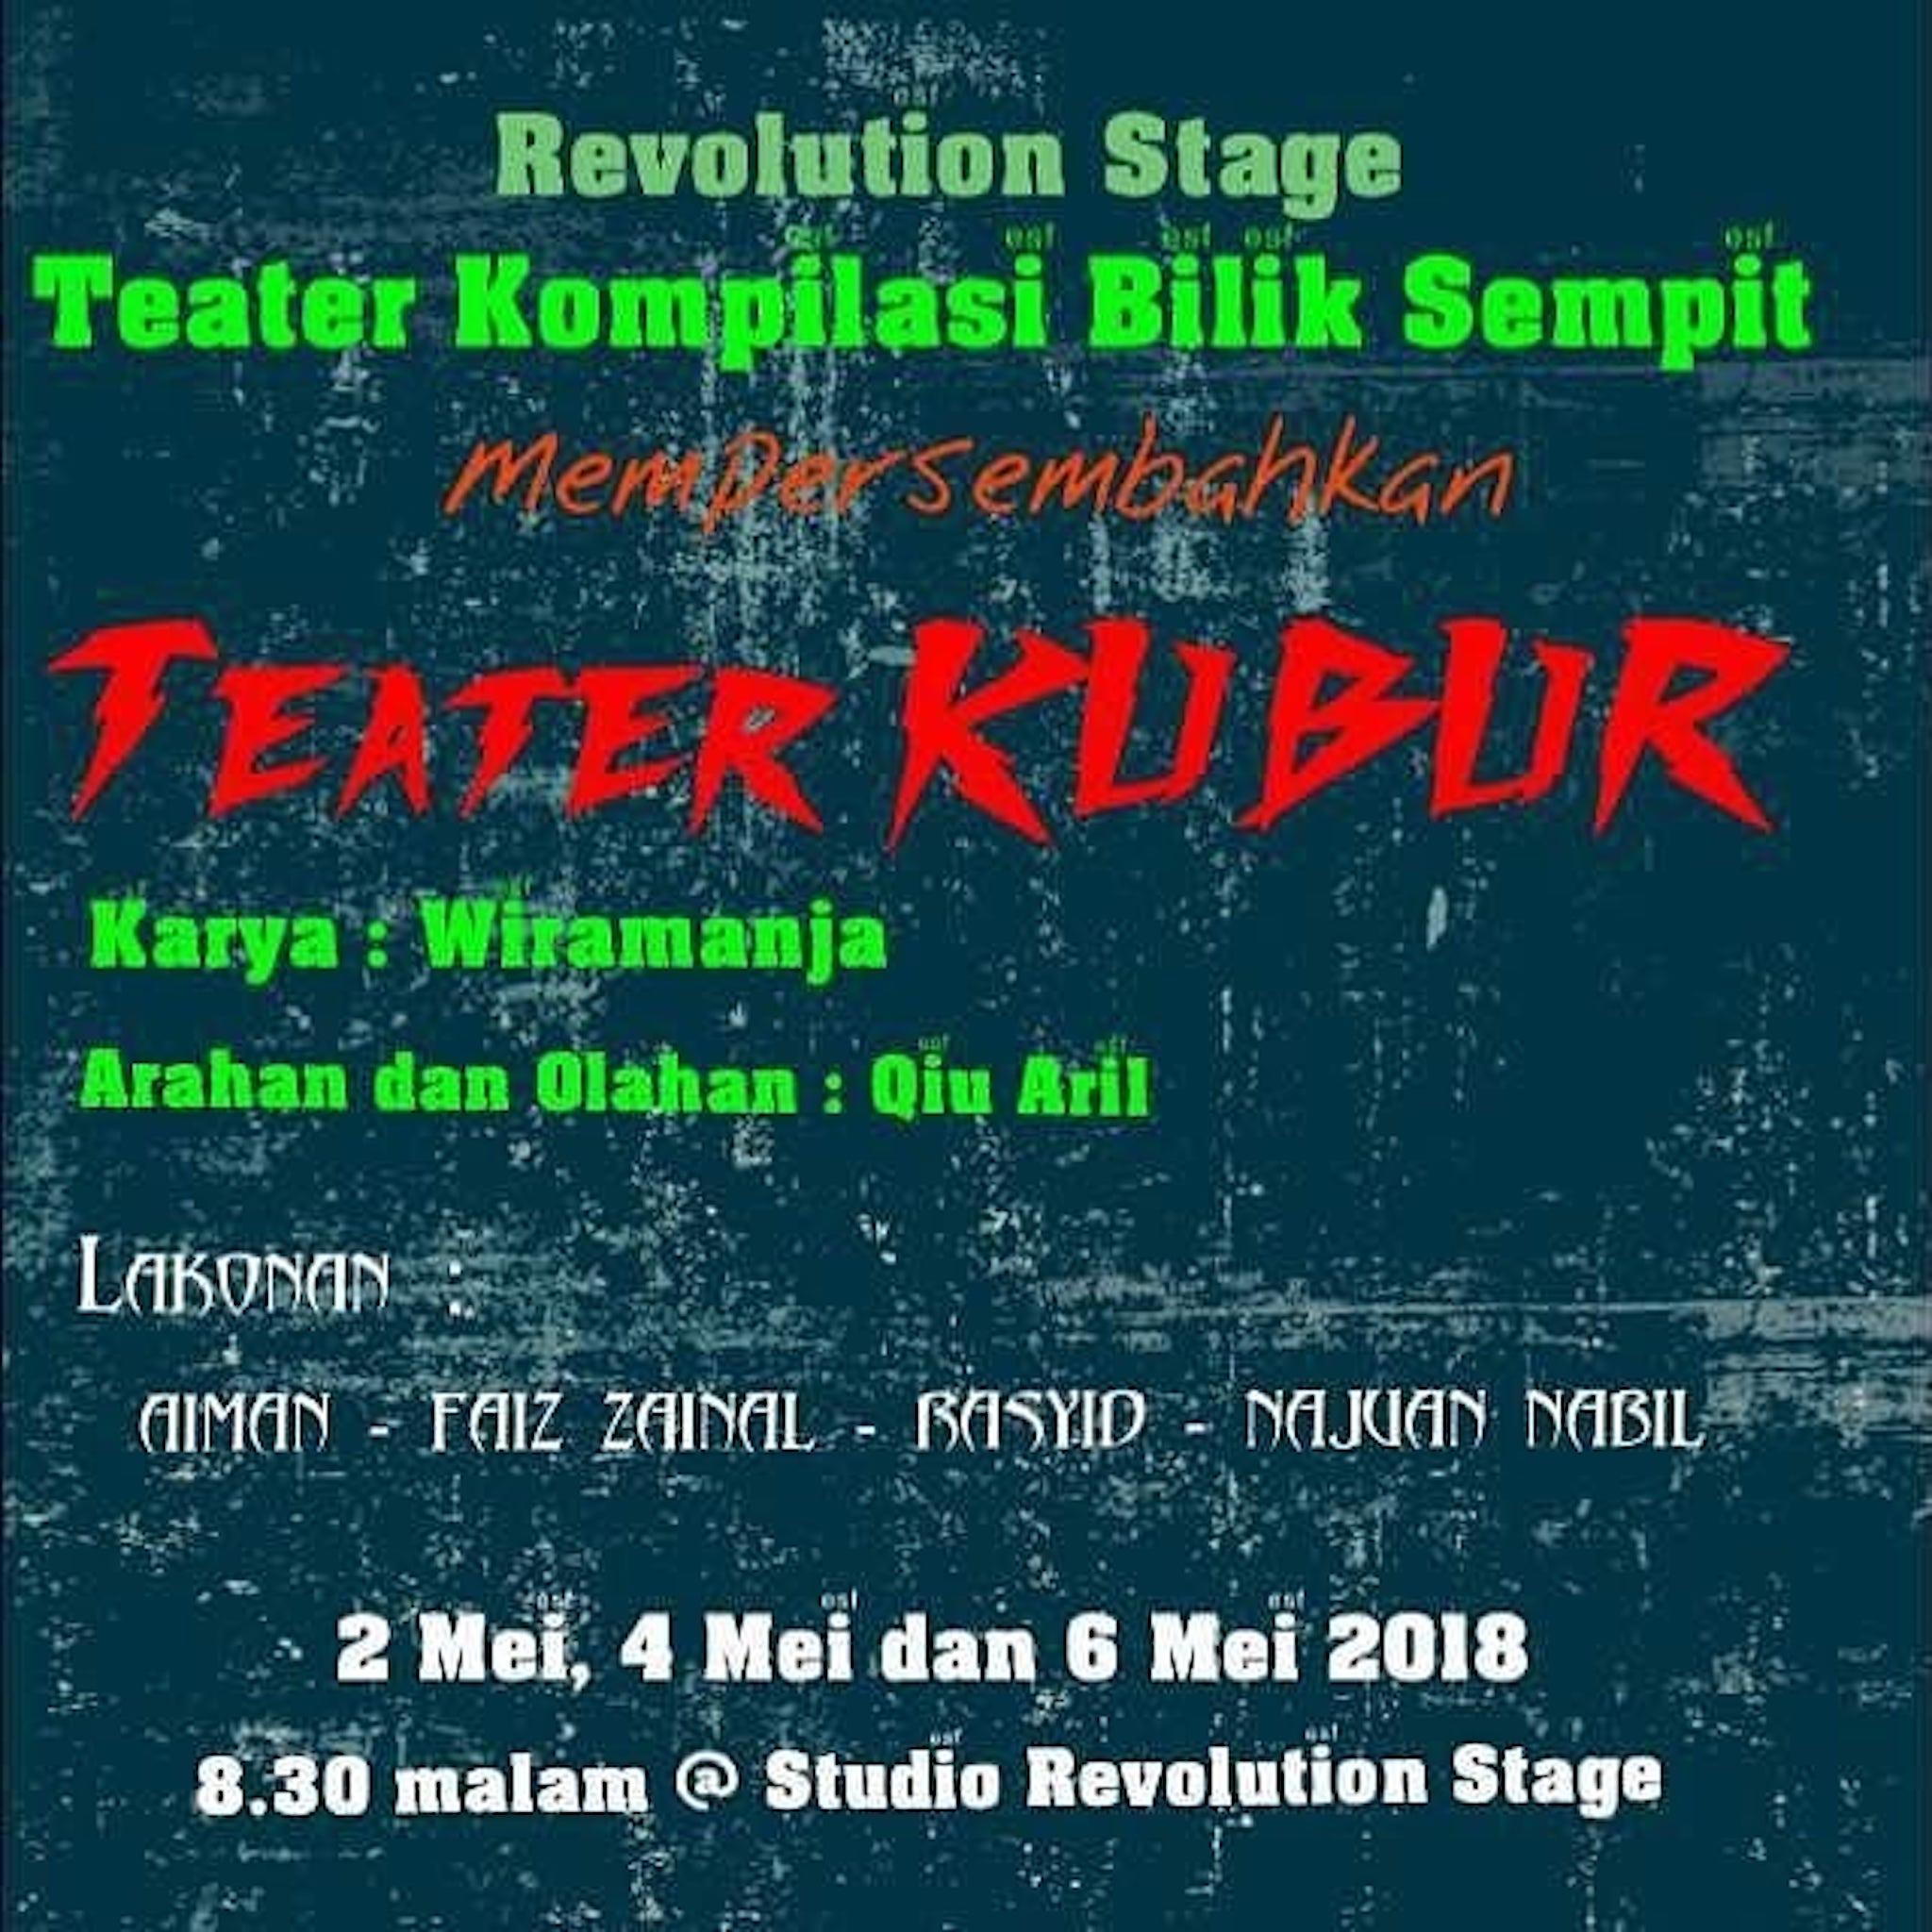 2018 Teater Kompilasi Bilik Sempit Kubur cover